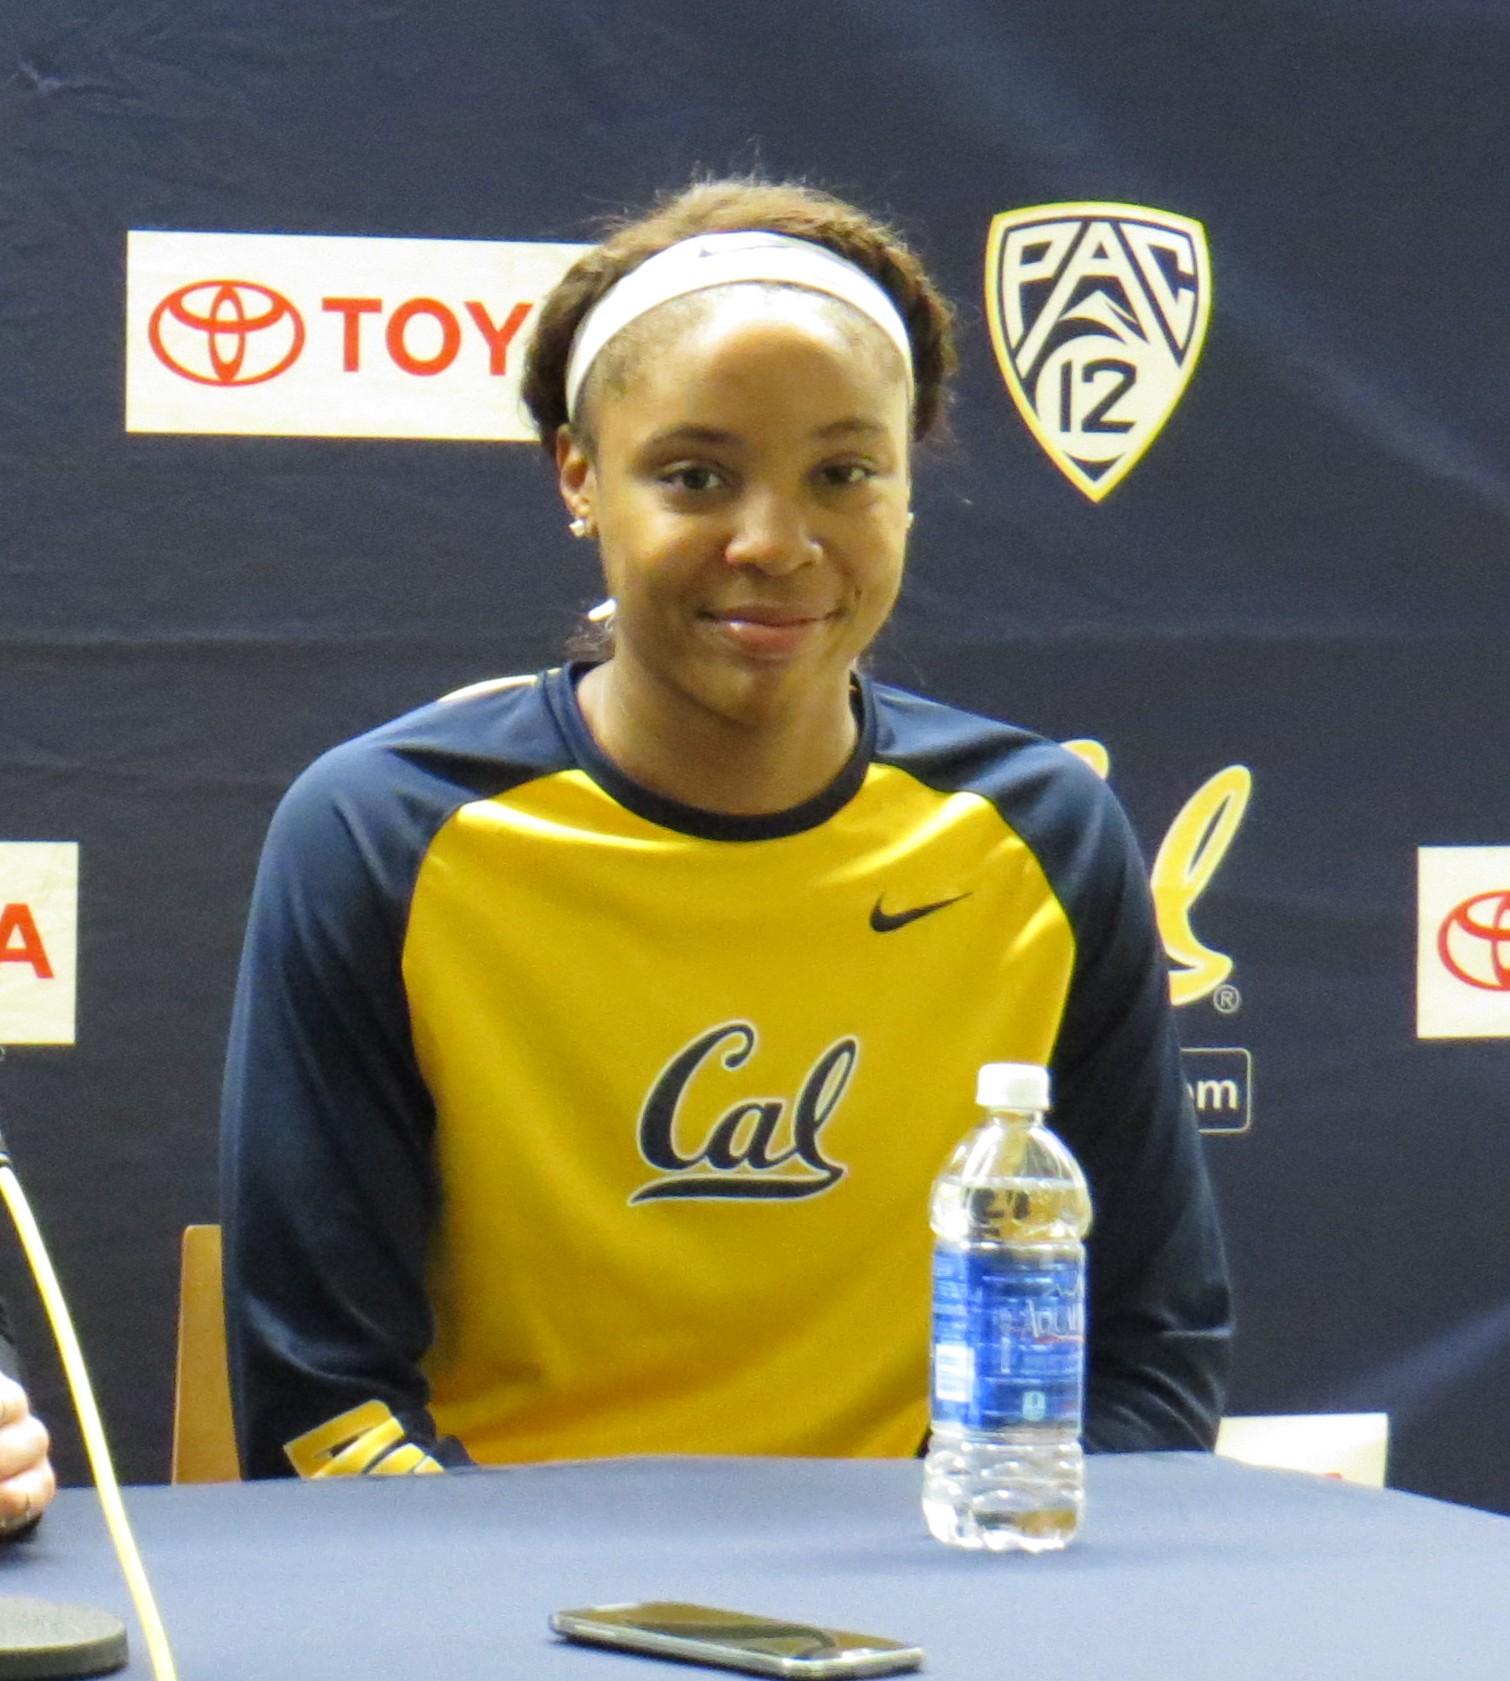 Cal's star freshman forward Kristine Anigwe on a quest for self-improvement